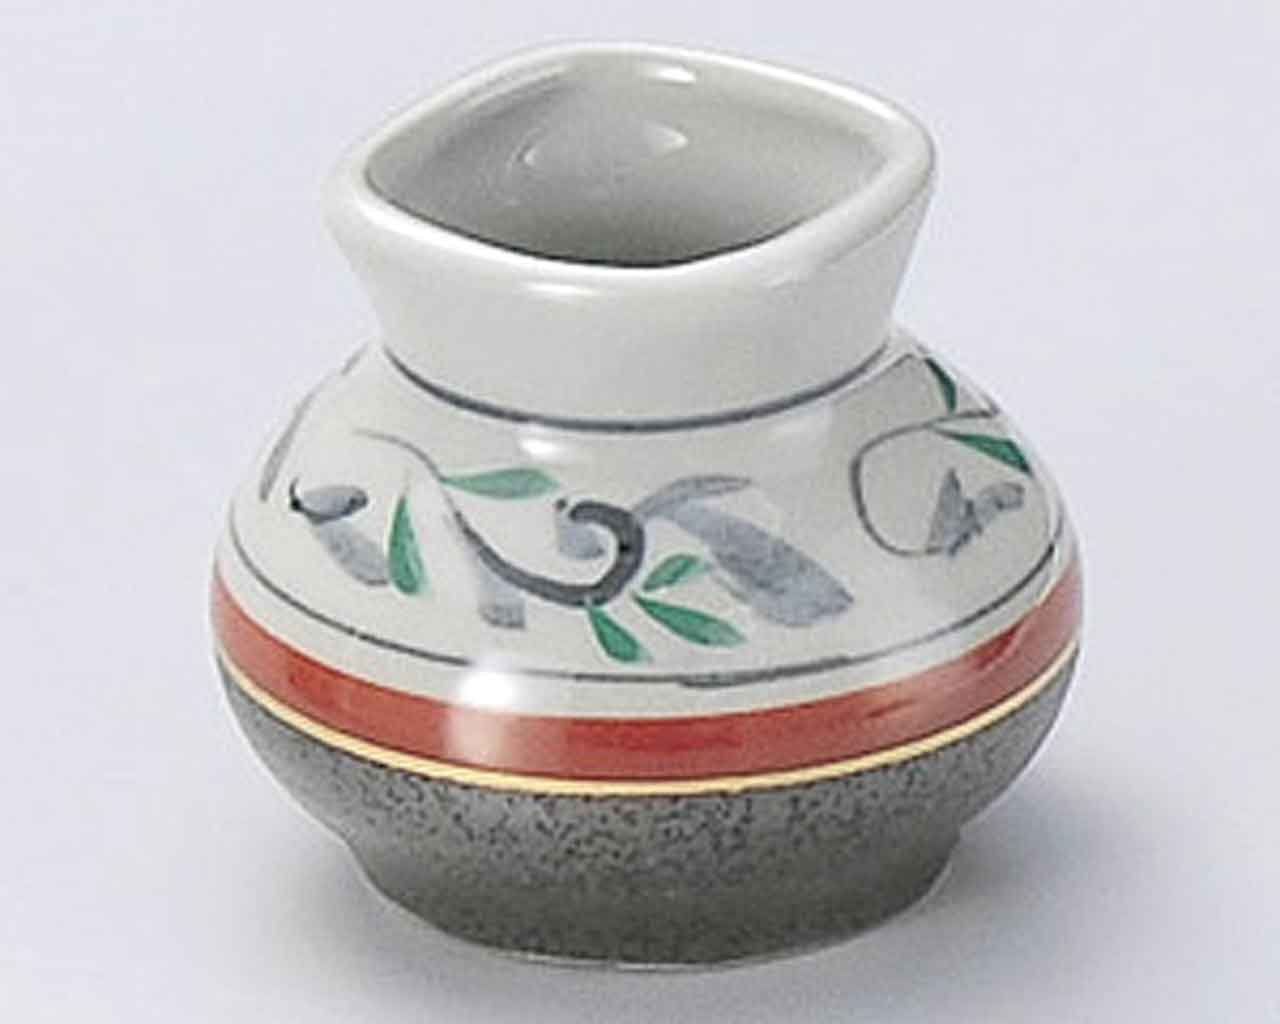 Tessa Karakusa 2.6inch Set of 5 Toothpick holders Grey Ceramic Made in Japan by Watou.asia